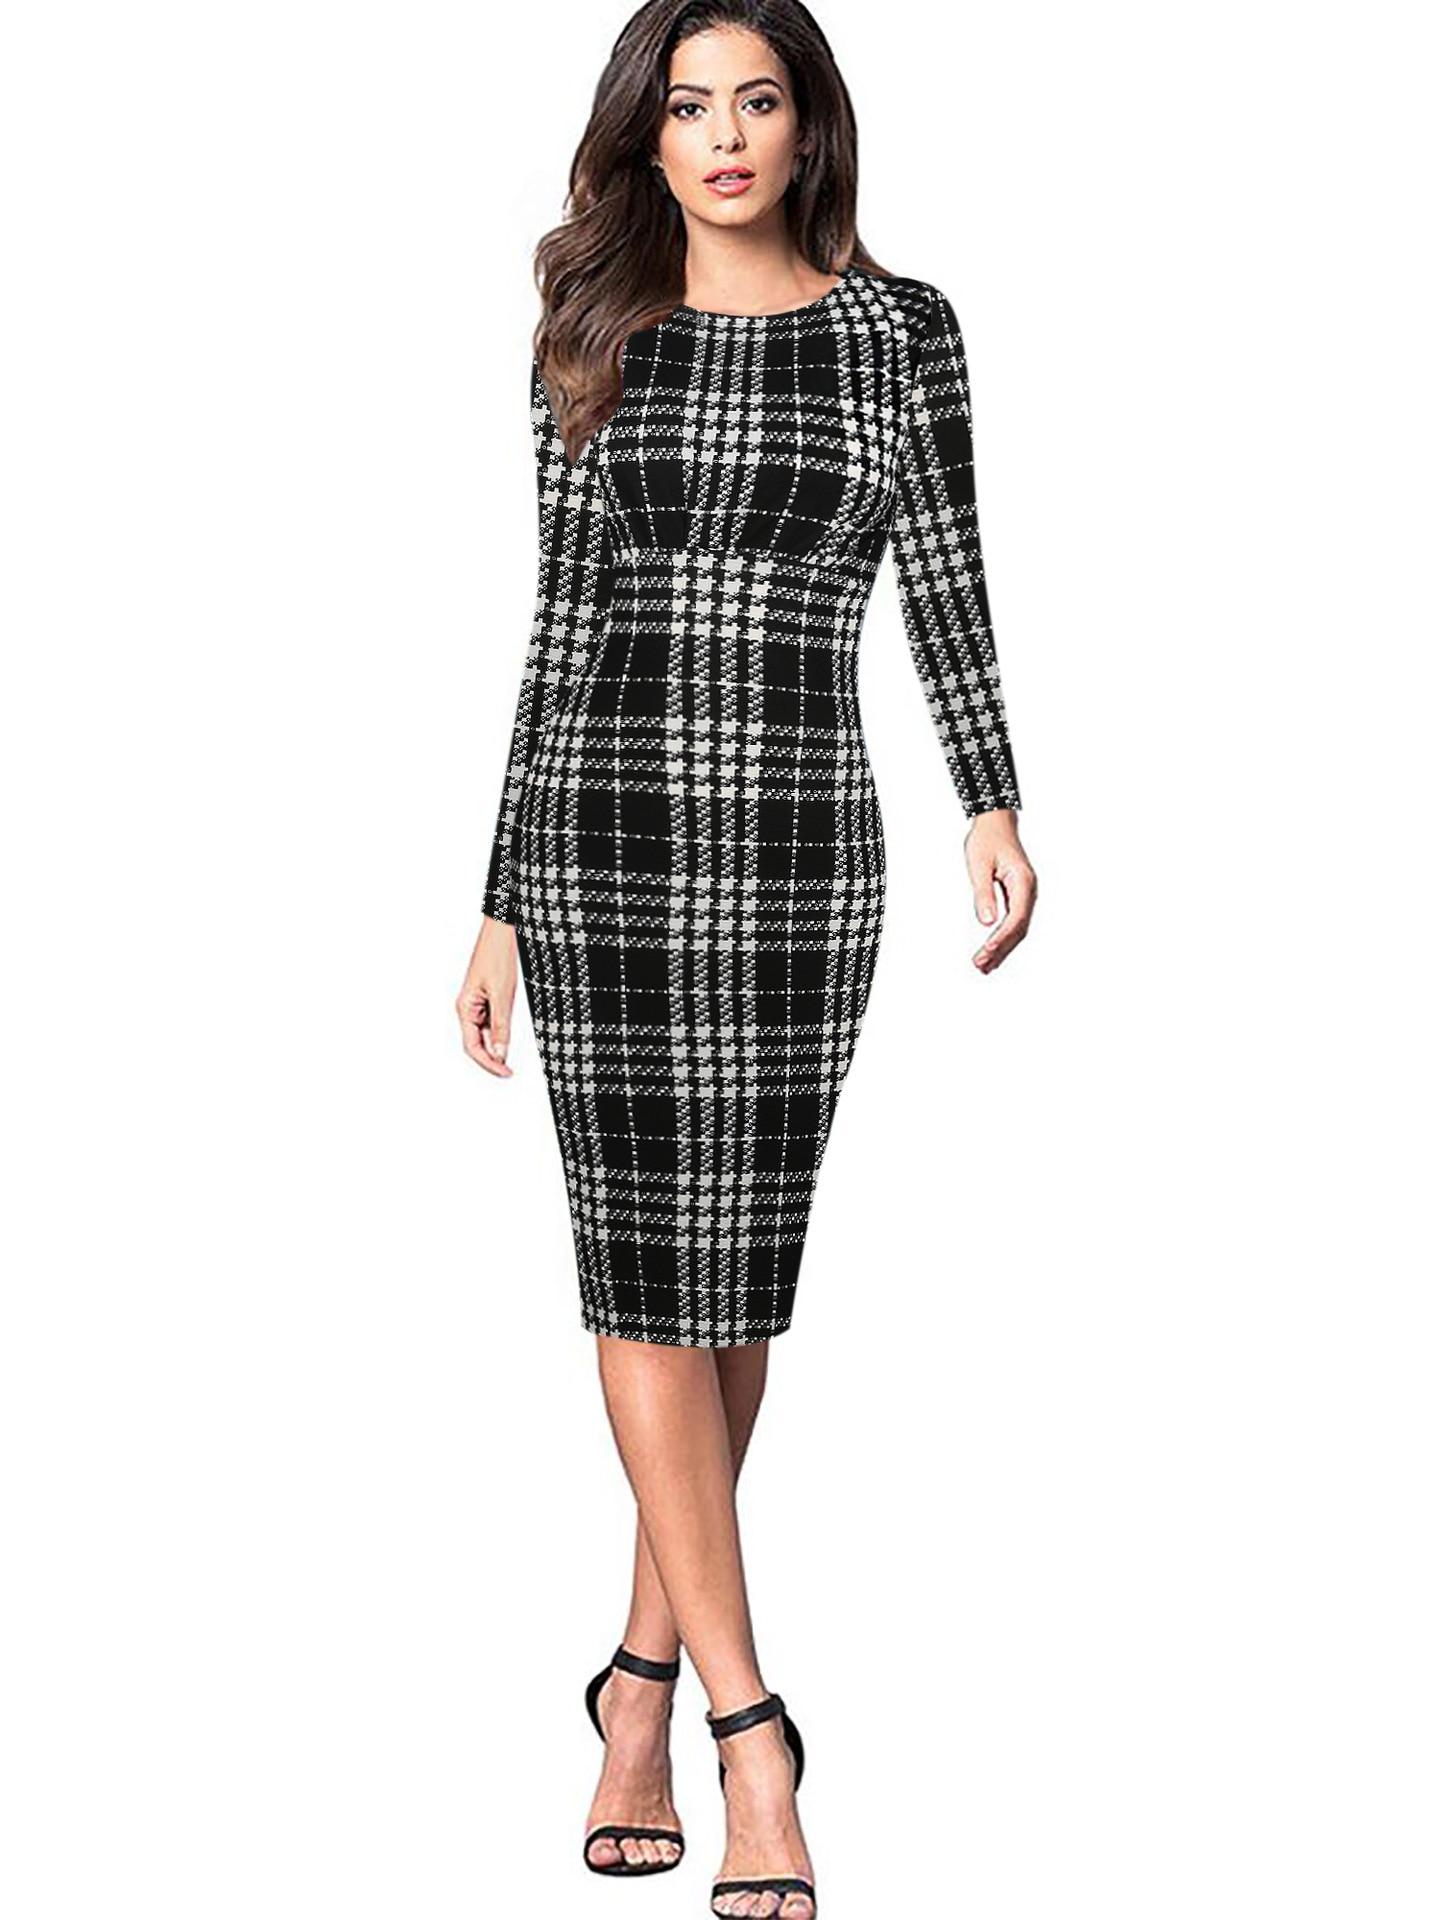 94cc48b110c00 MAYFULL S 2XL QUALITY Women O Neck Full Sleeve Empire Plaid Dress ...